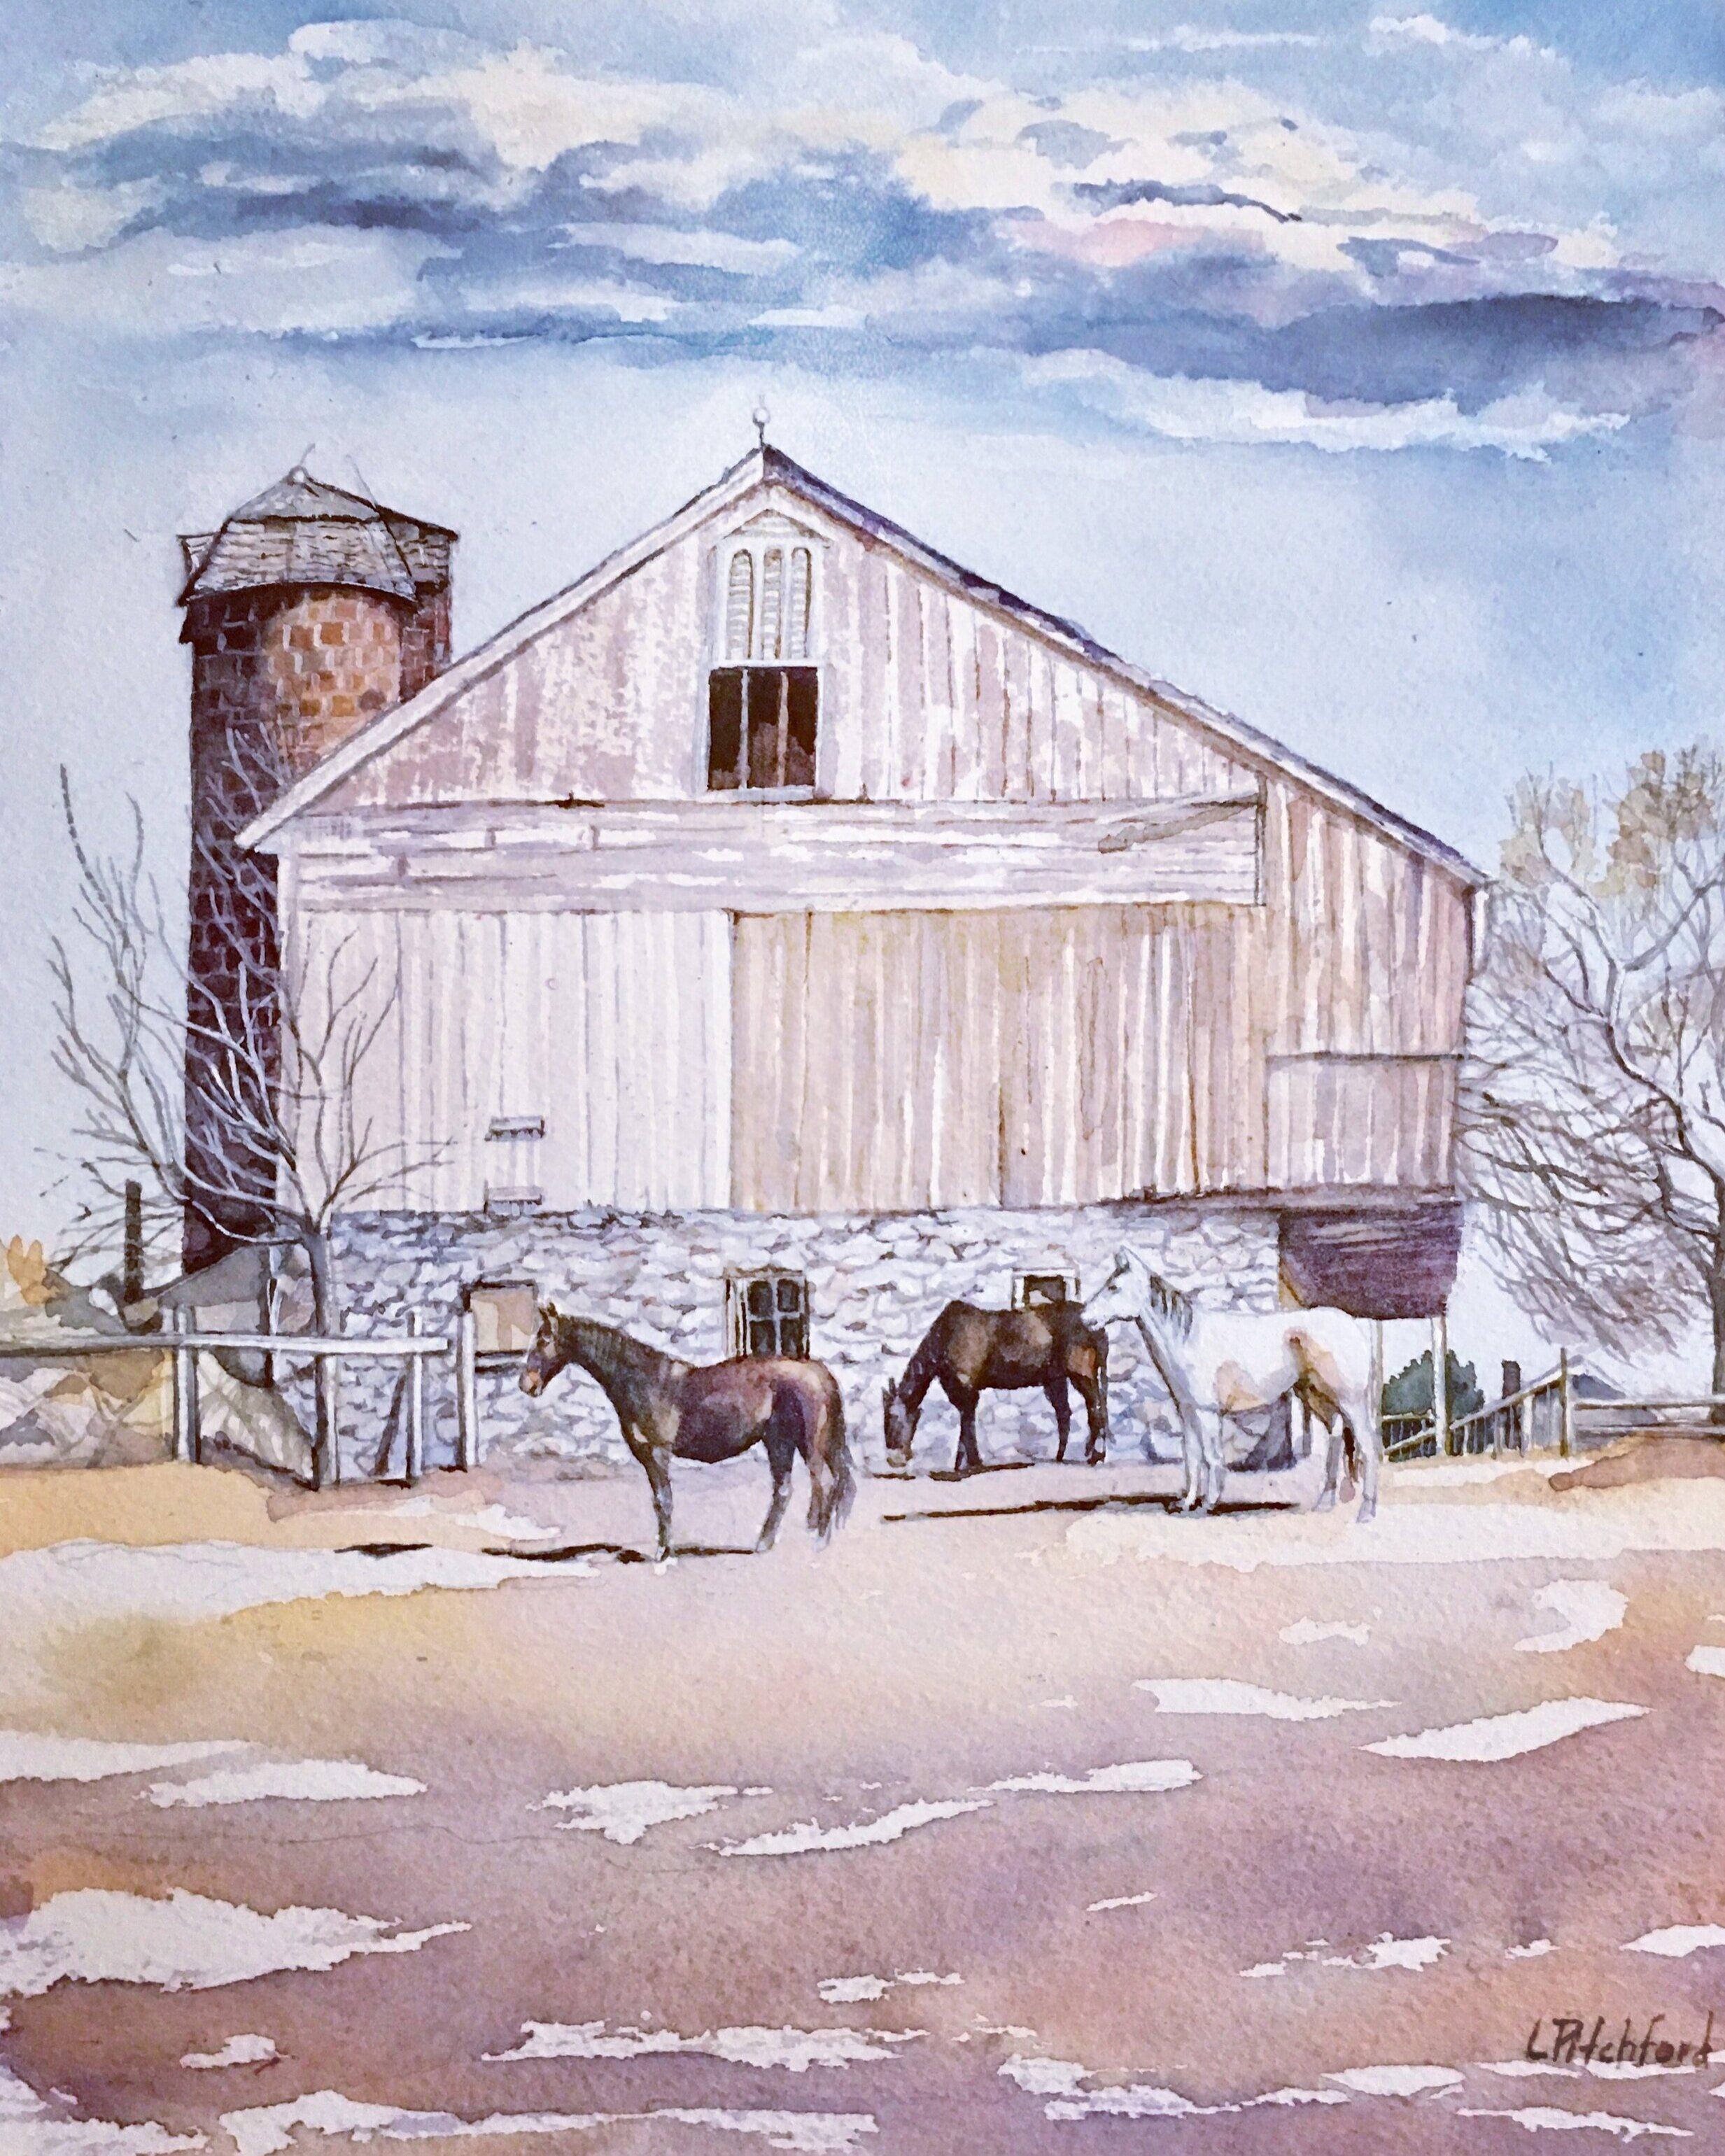 barn-chimney-horses.jpg